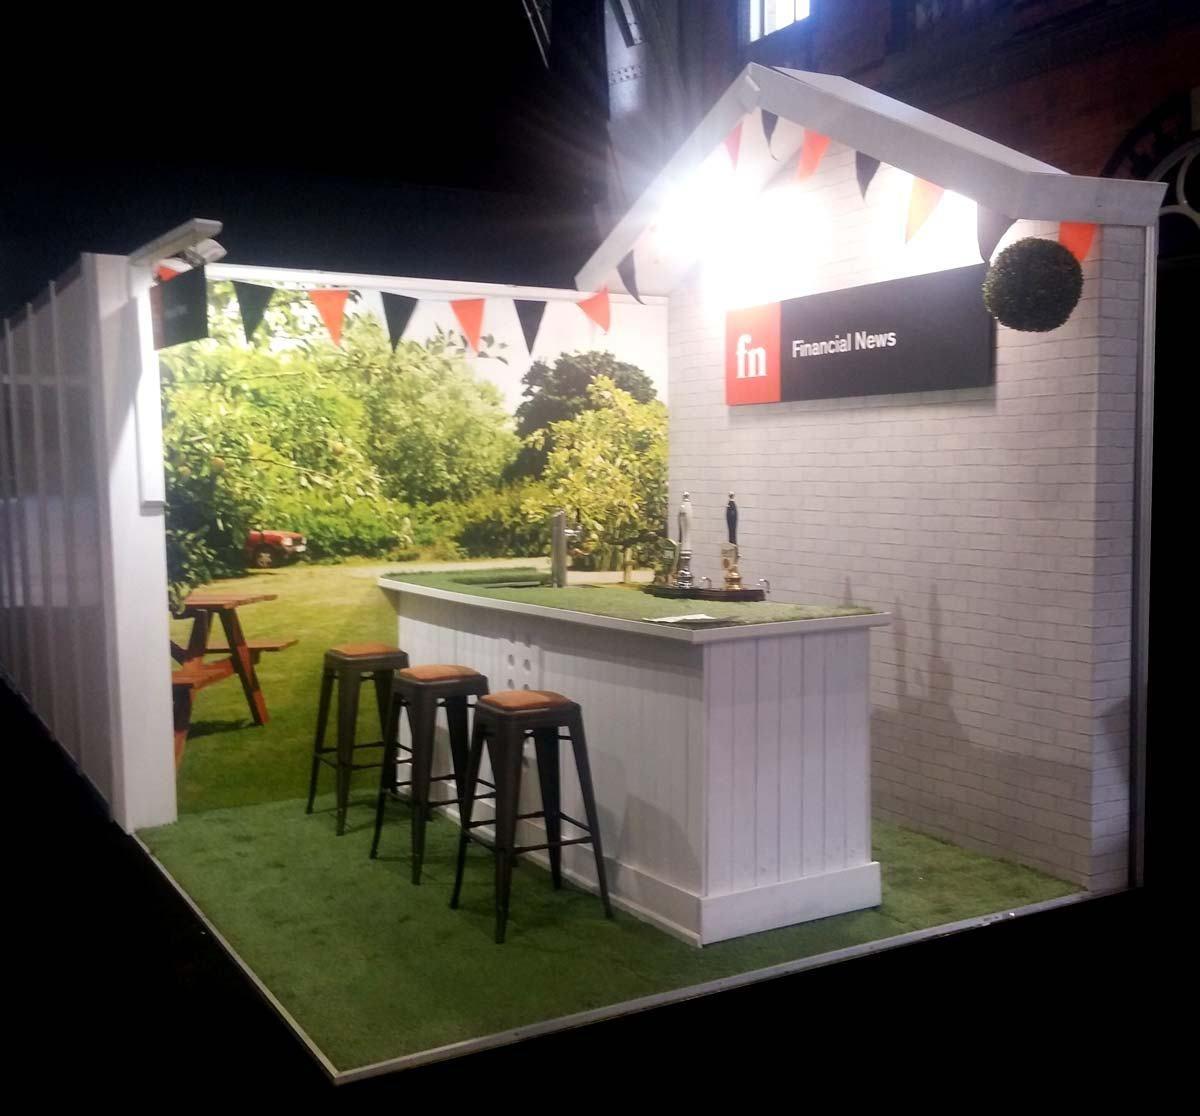 Exhibition Stand Builders Uk : Financial news garden pub booth at plsa manchester exhibition